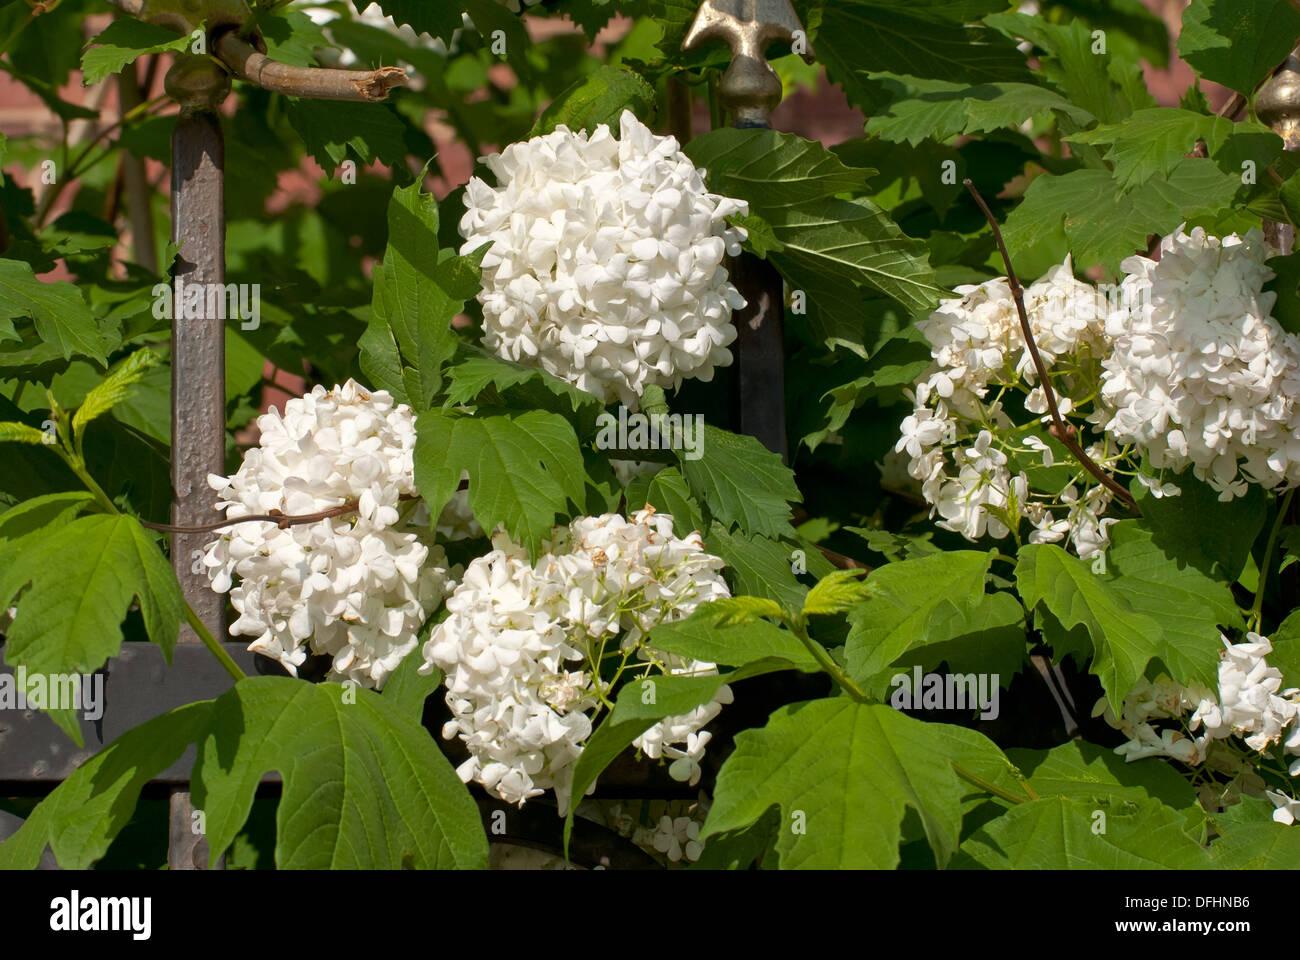 Green bush white flowers stock photos green bush white flowers the buds of white flowers on a green bush on a bright sunny day mightylinksfo